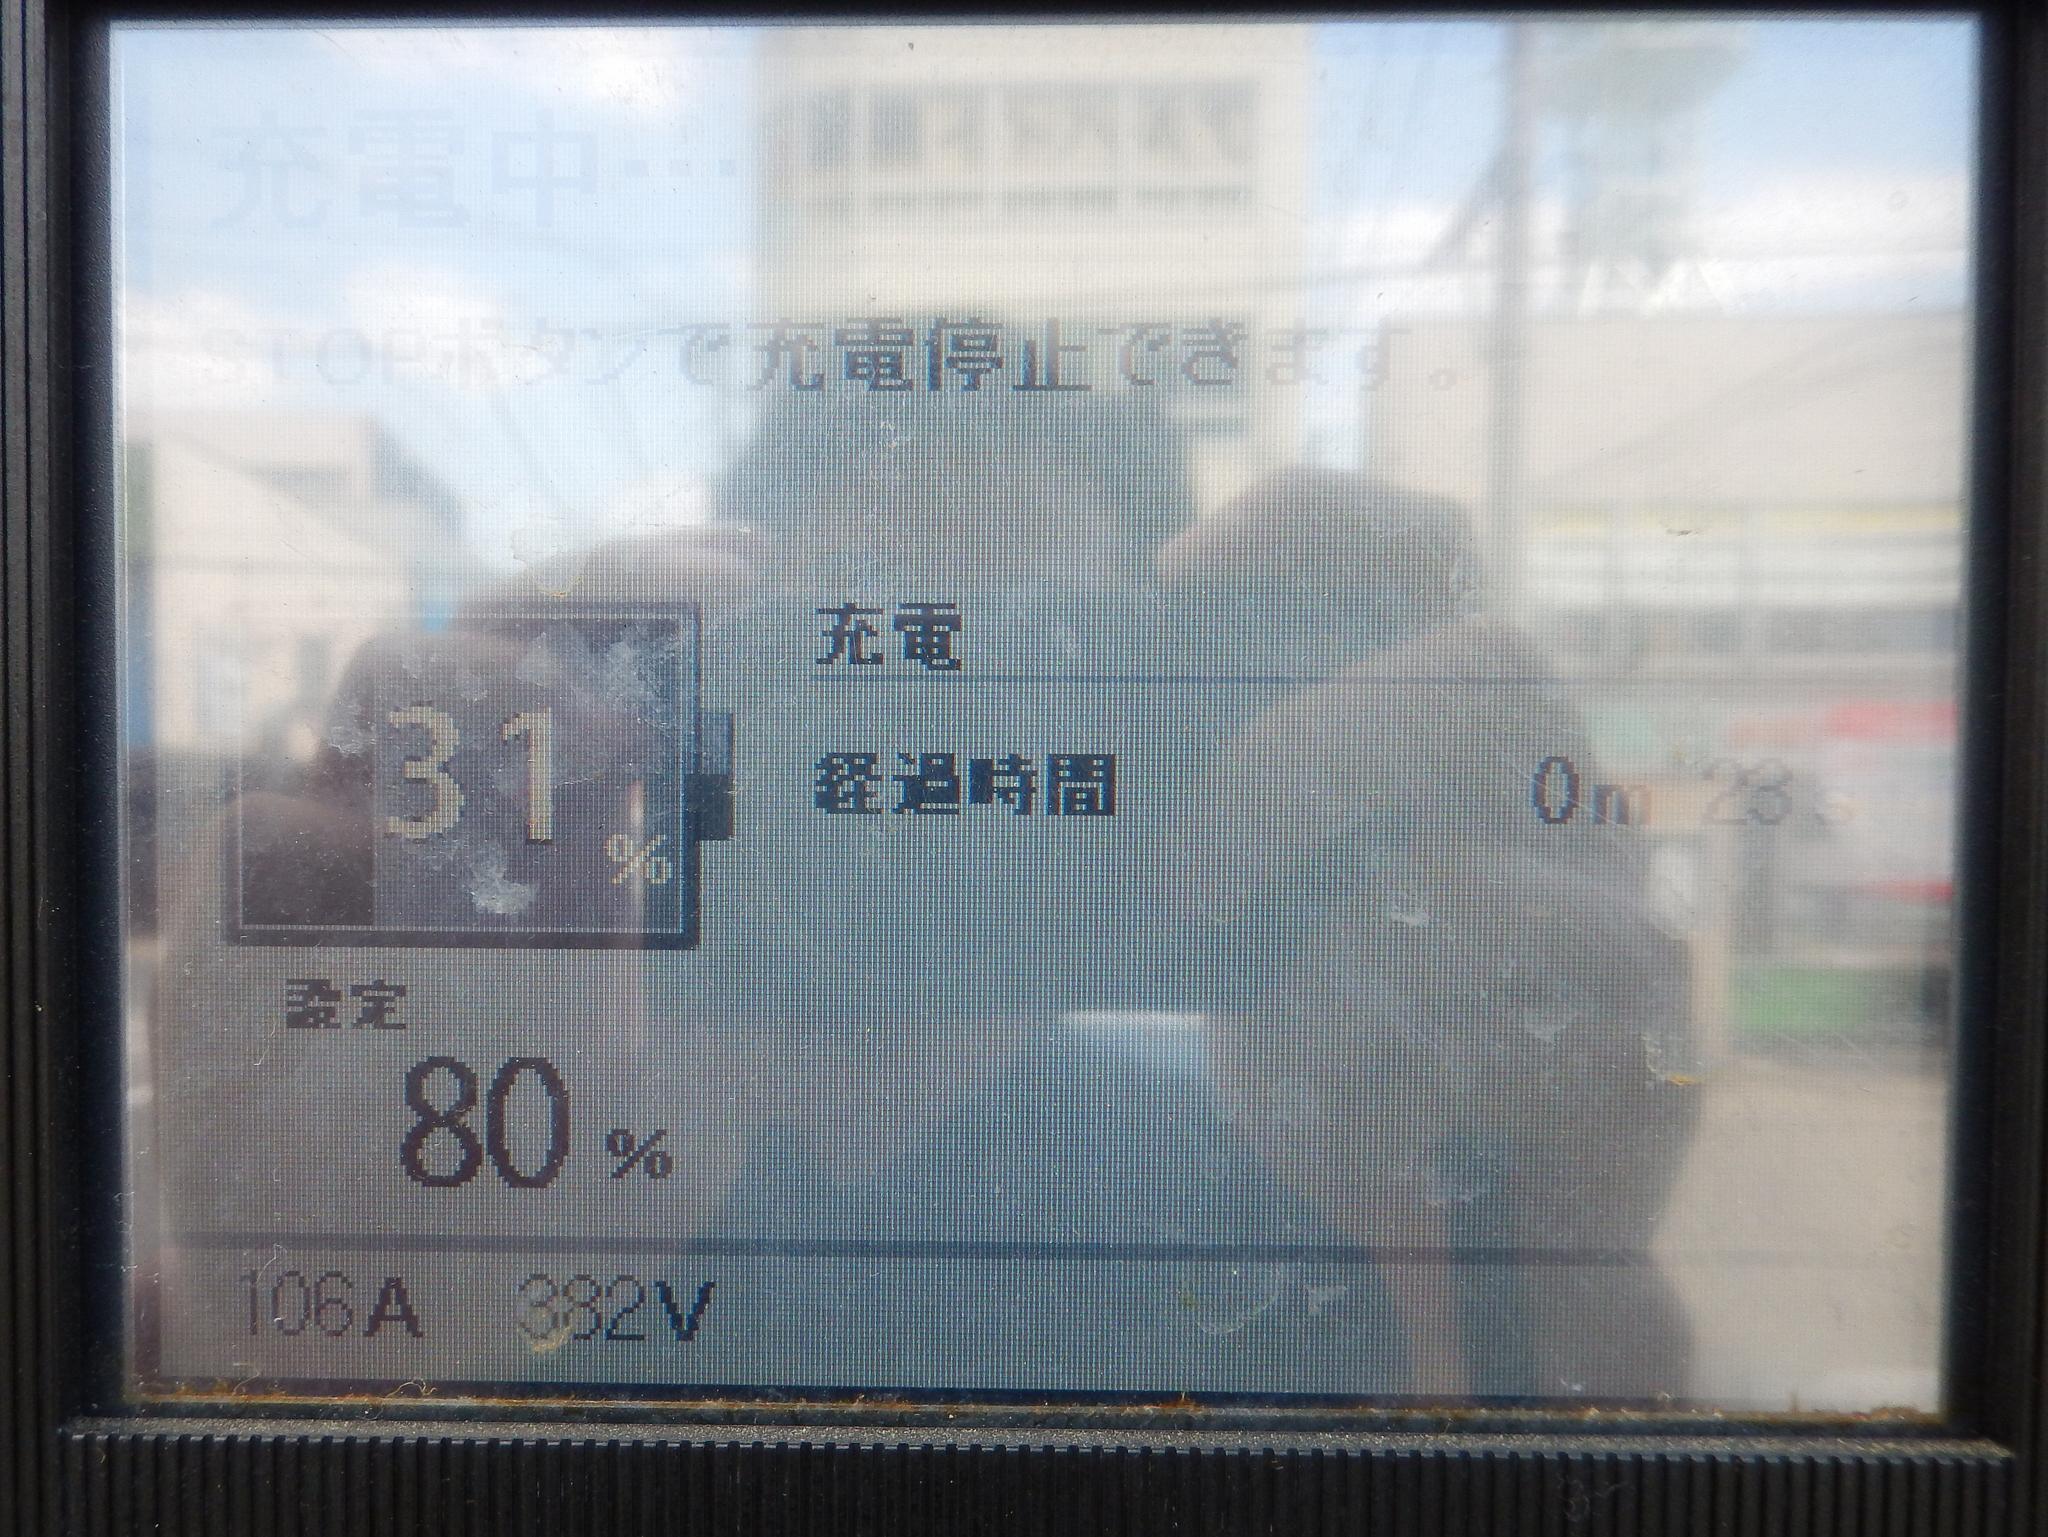 f:id:ToshUeno:20150513140603j:plain